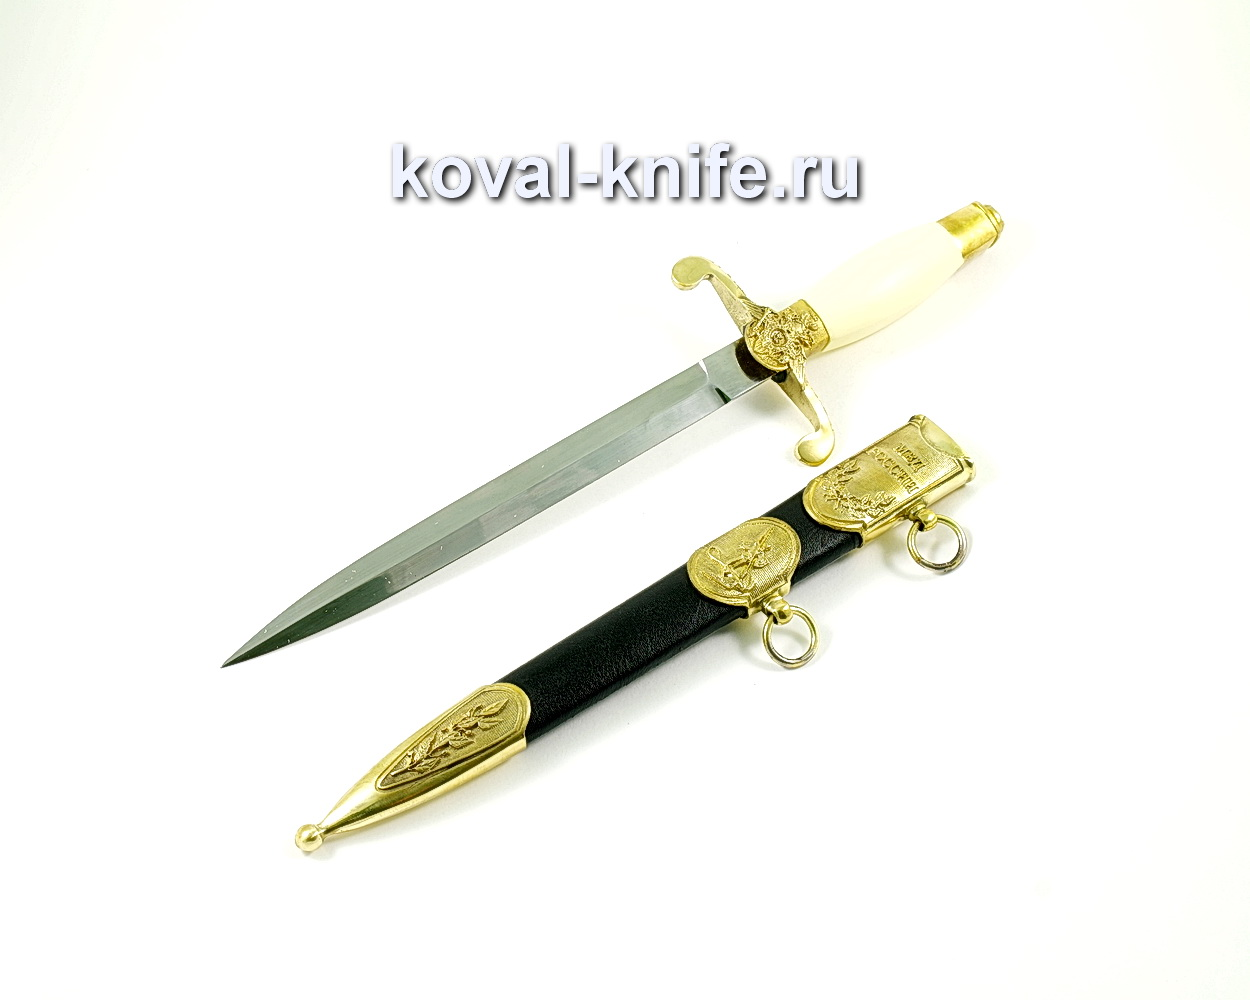 Кортик «МВД России» (сталь 95х18), рукоять пластик A205